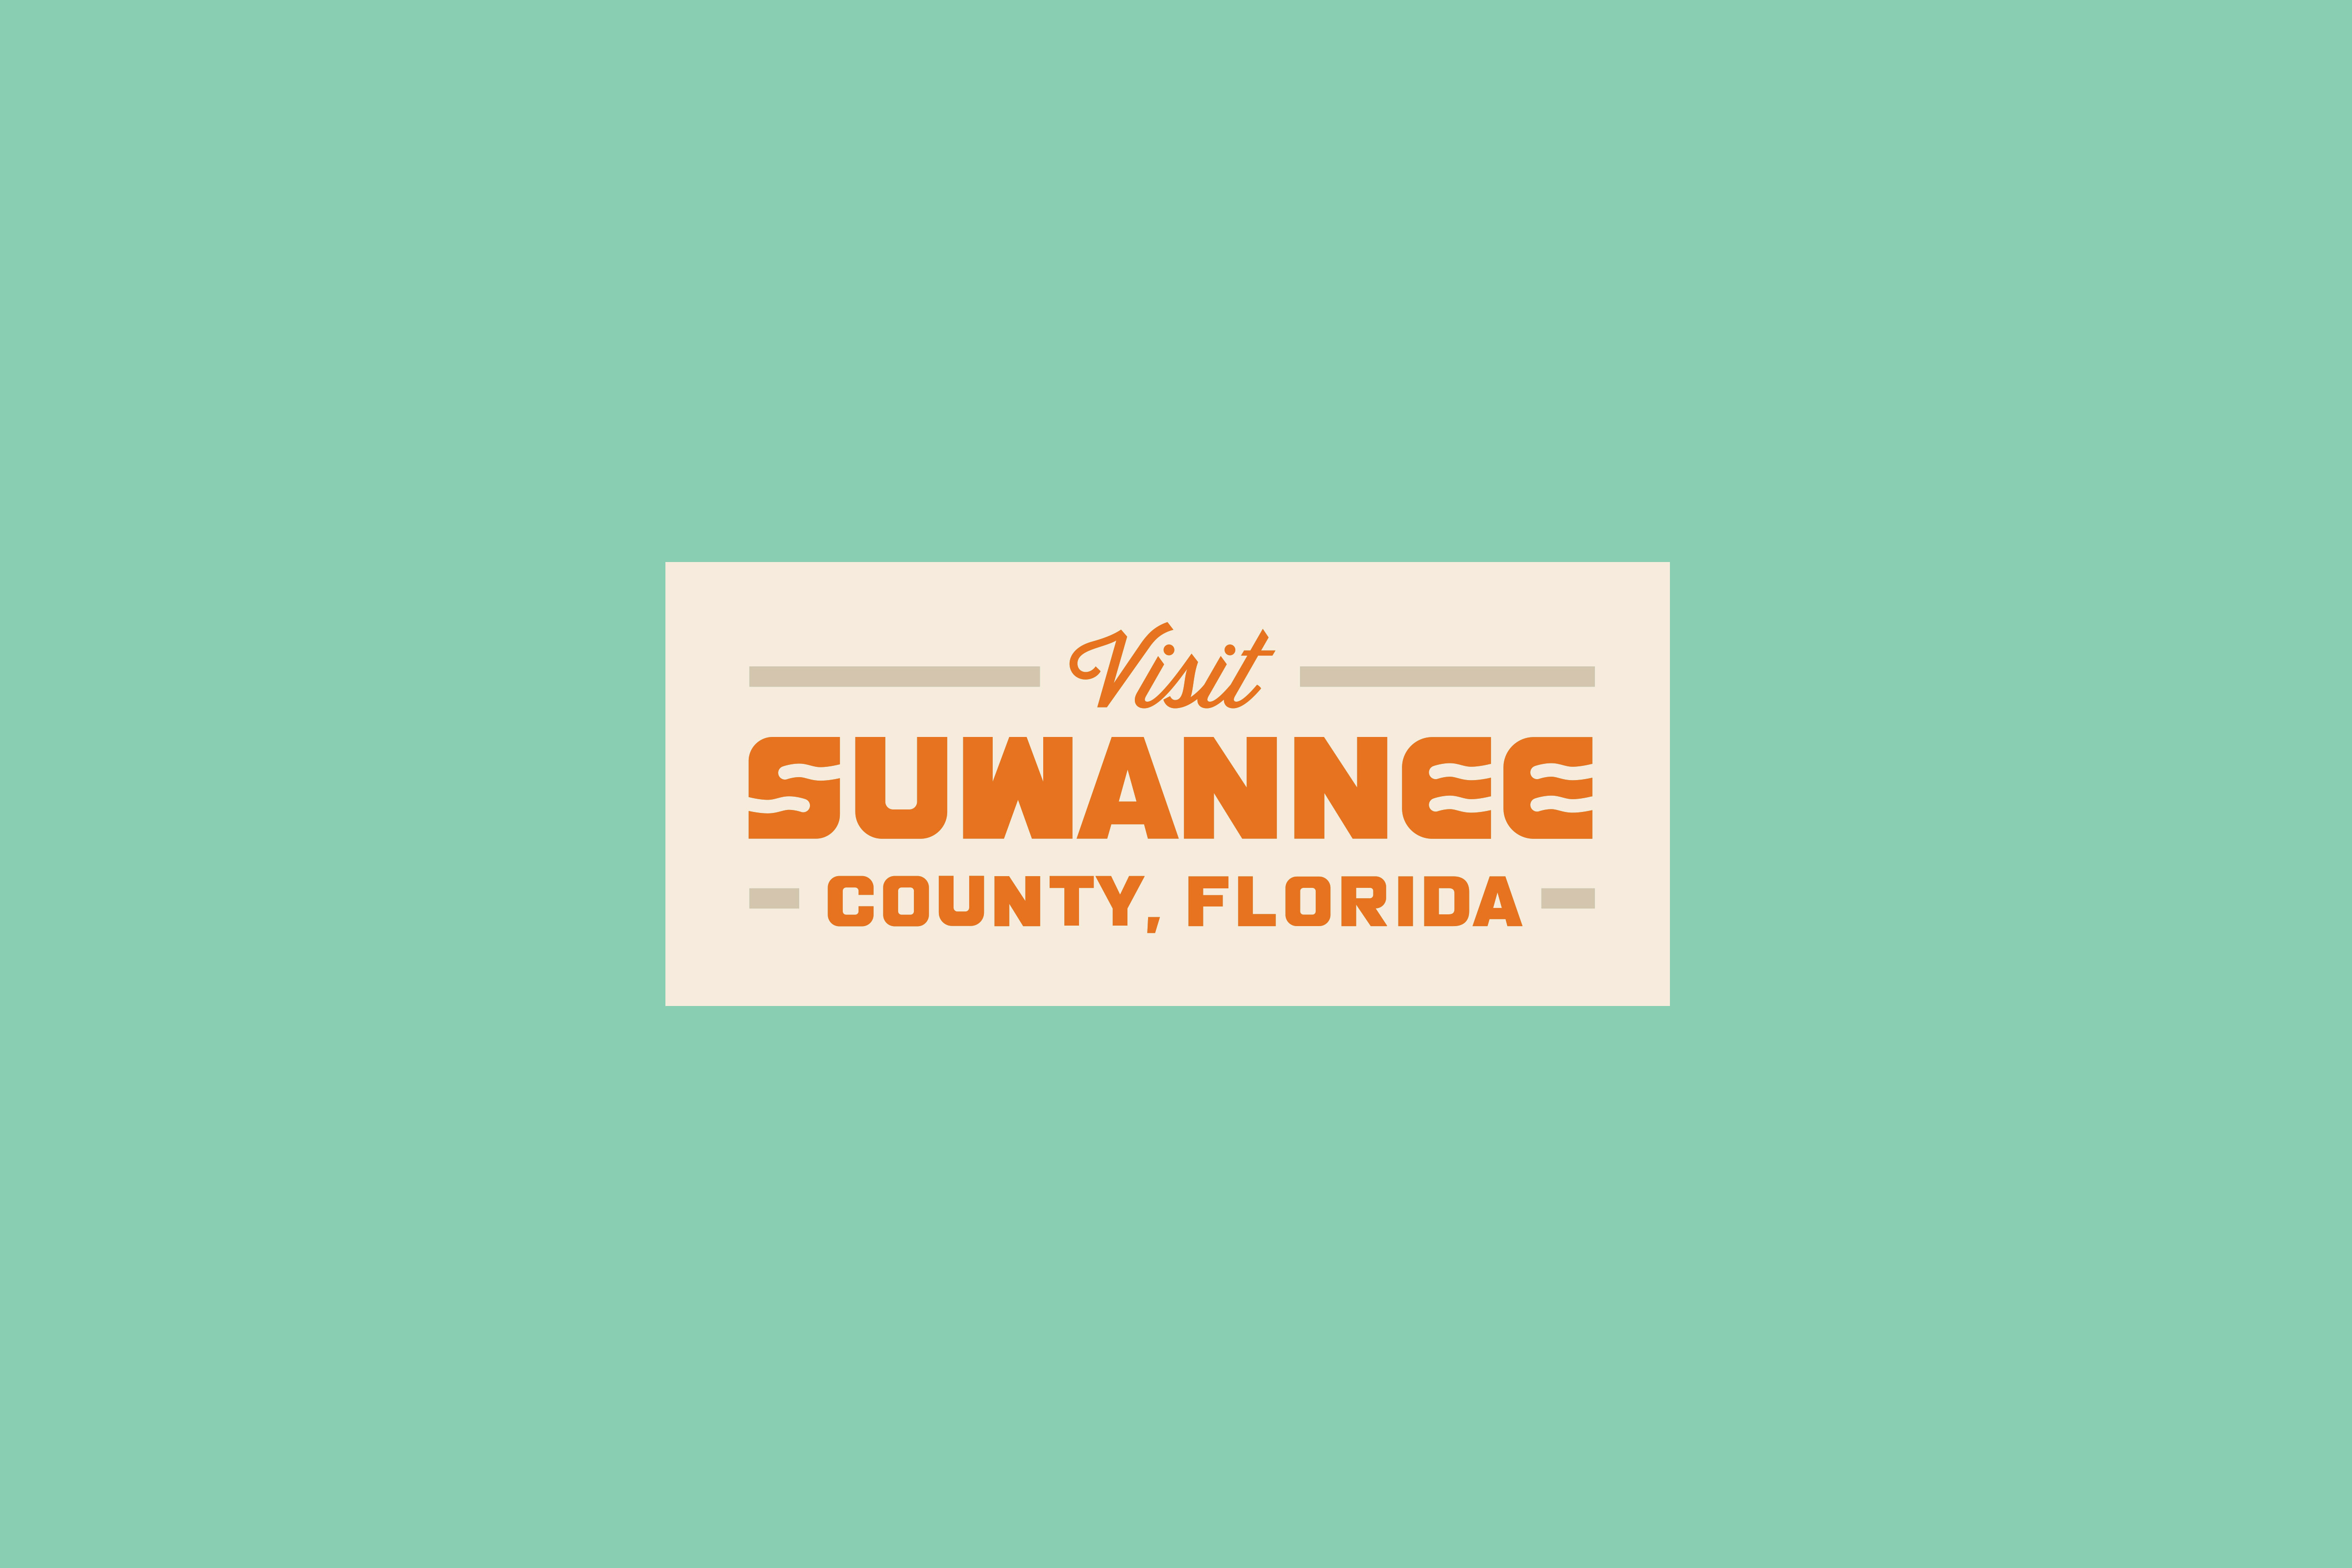 suwannee county florida typography design